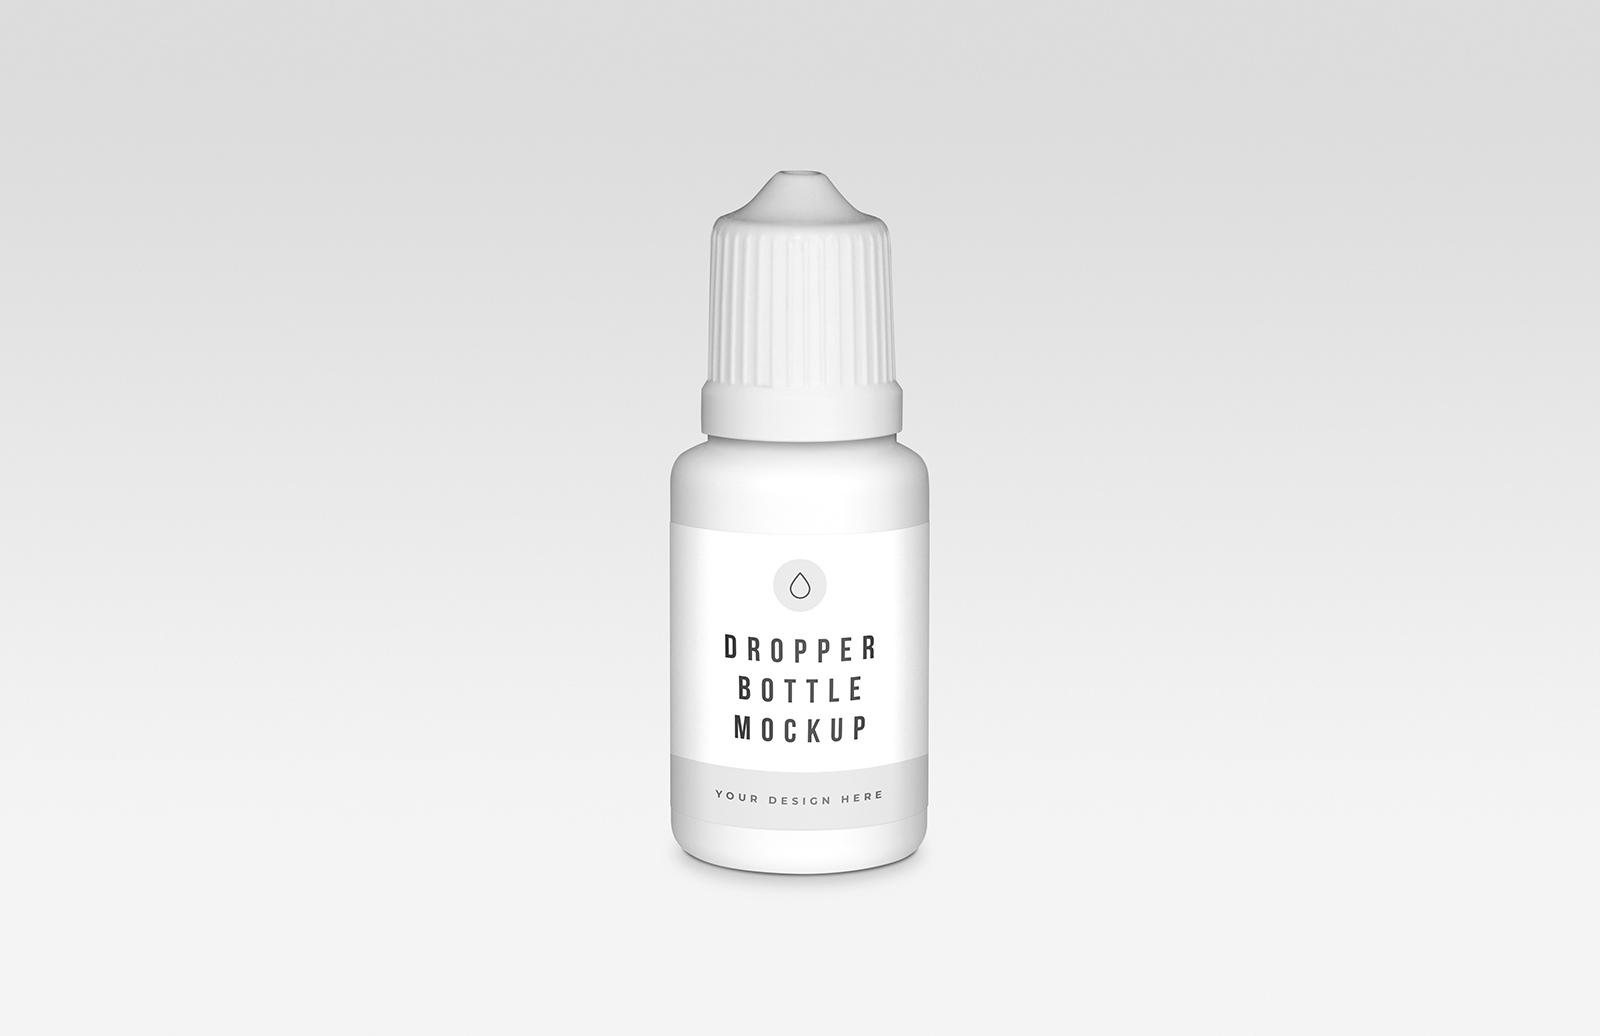 Dropper Bottle Mockup Preview 1B